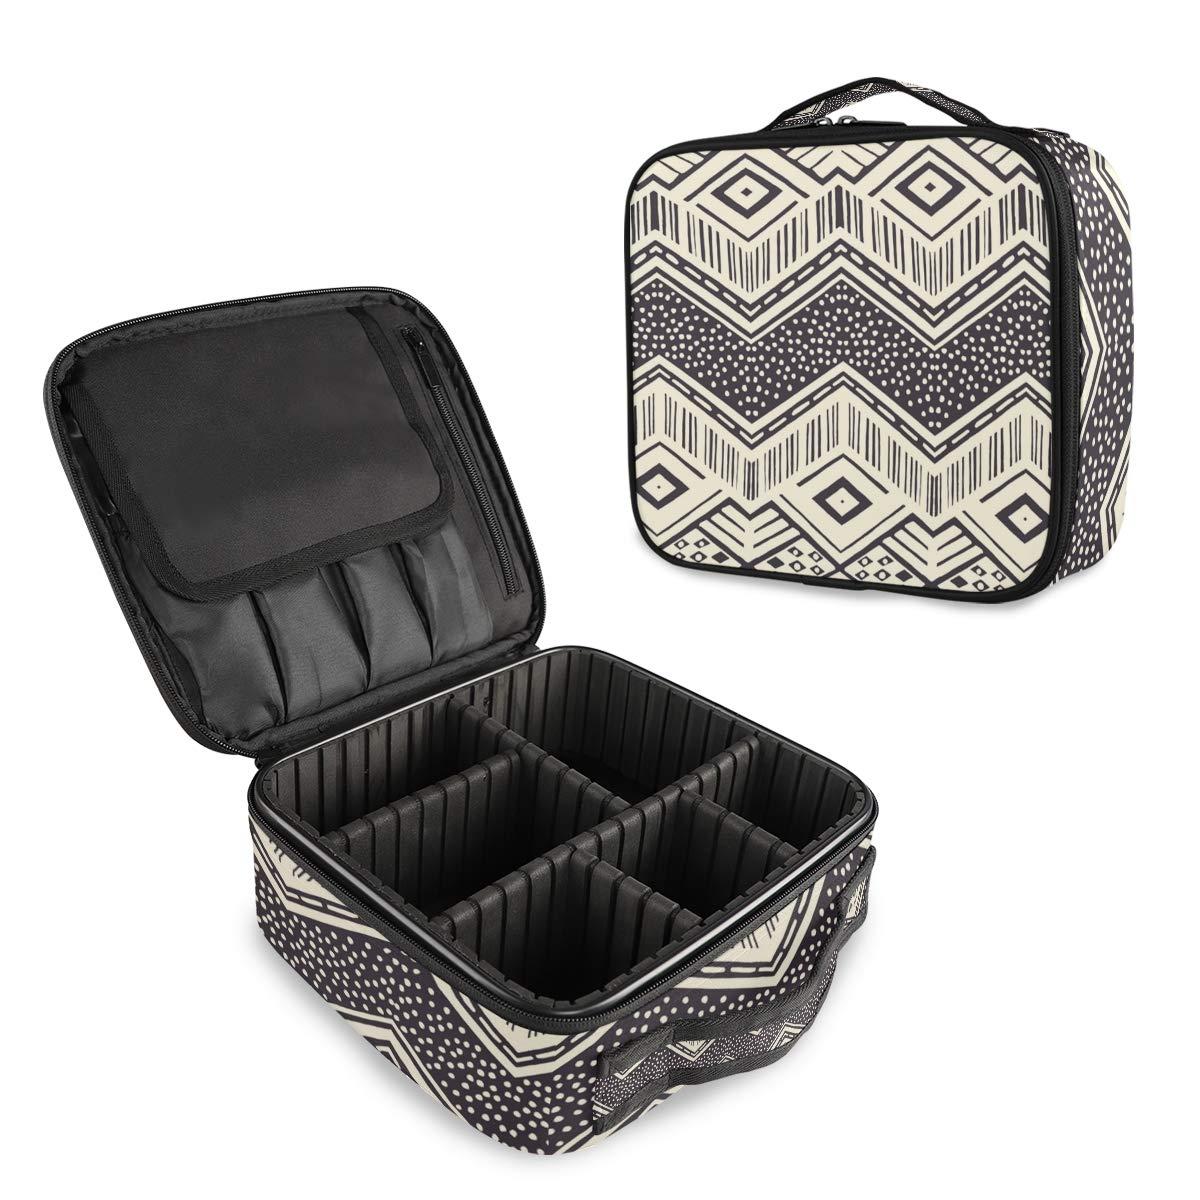 Travel Makeup Max 75% OFF Manufacturer regenerated product Case Geometric Lar Cosmetic Bag Train